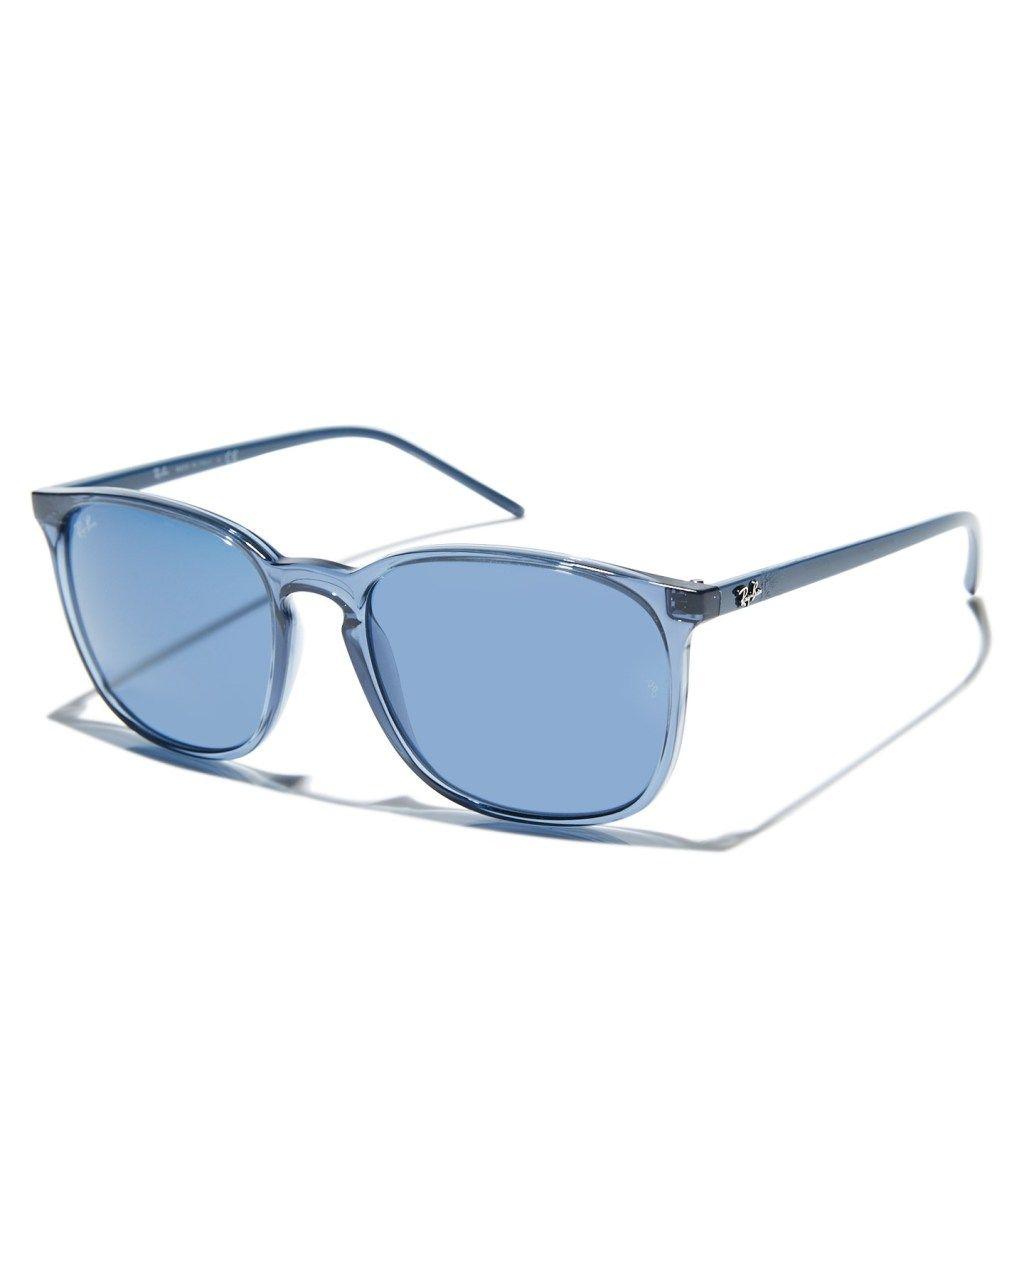 mens ray ban wayfarer sunglasses blue